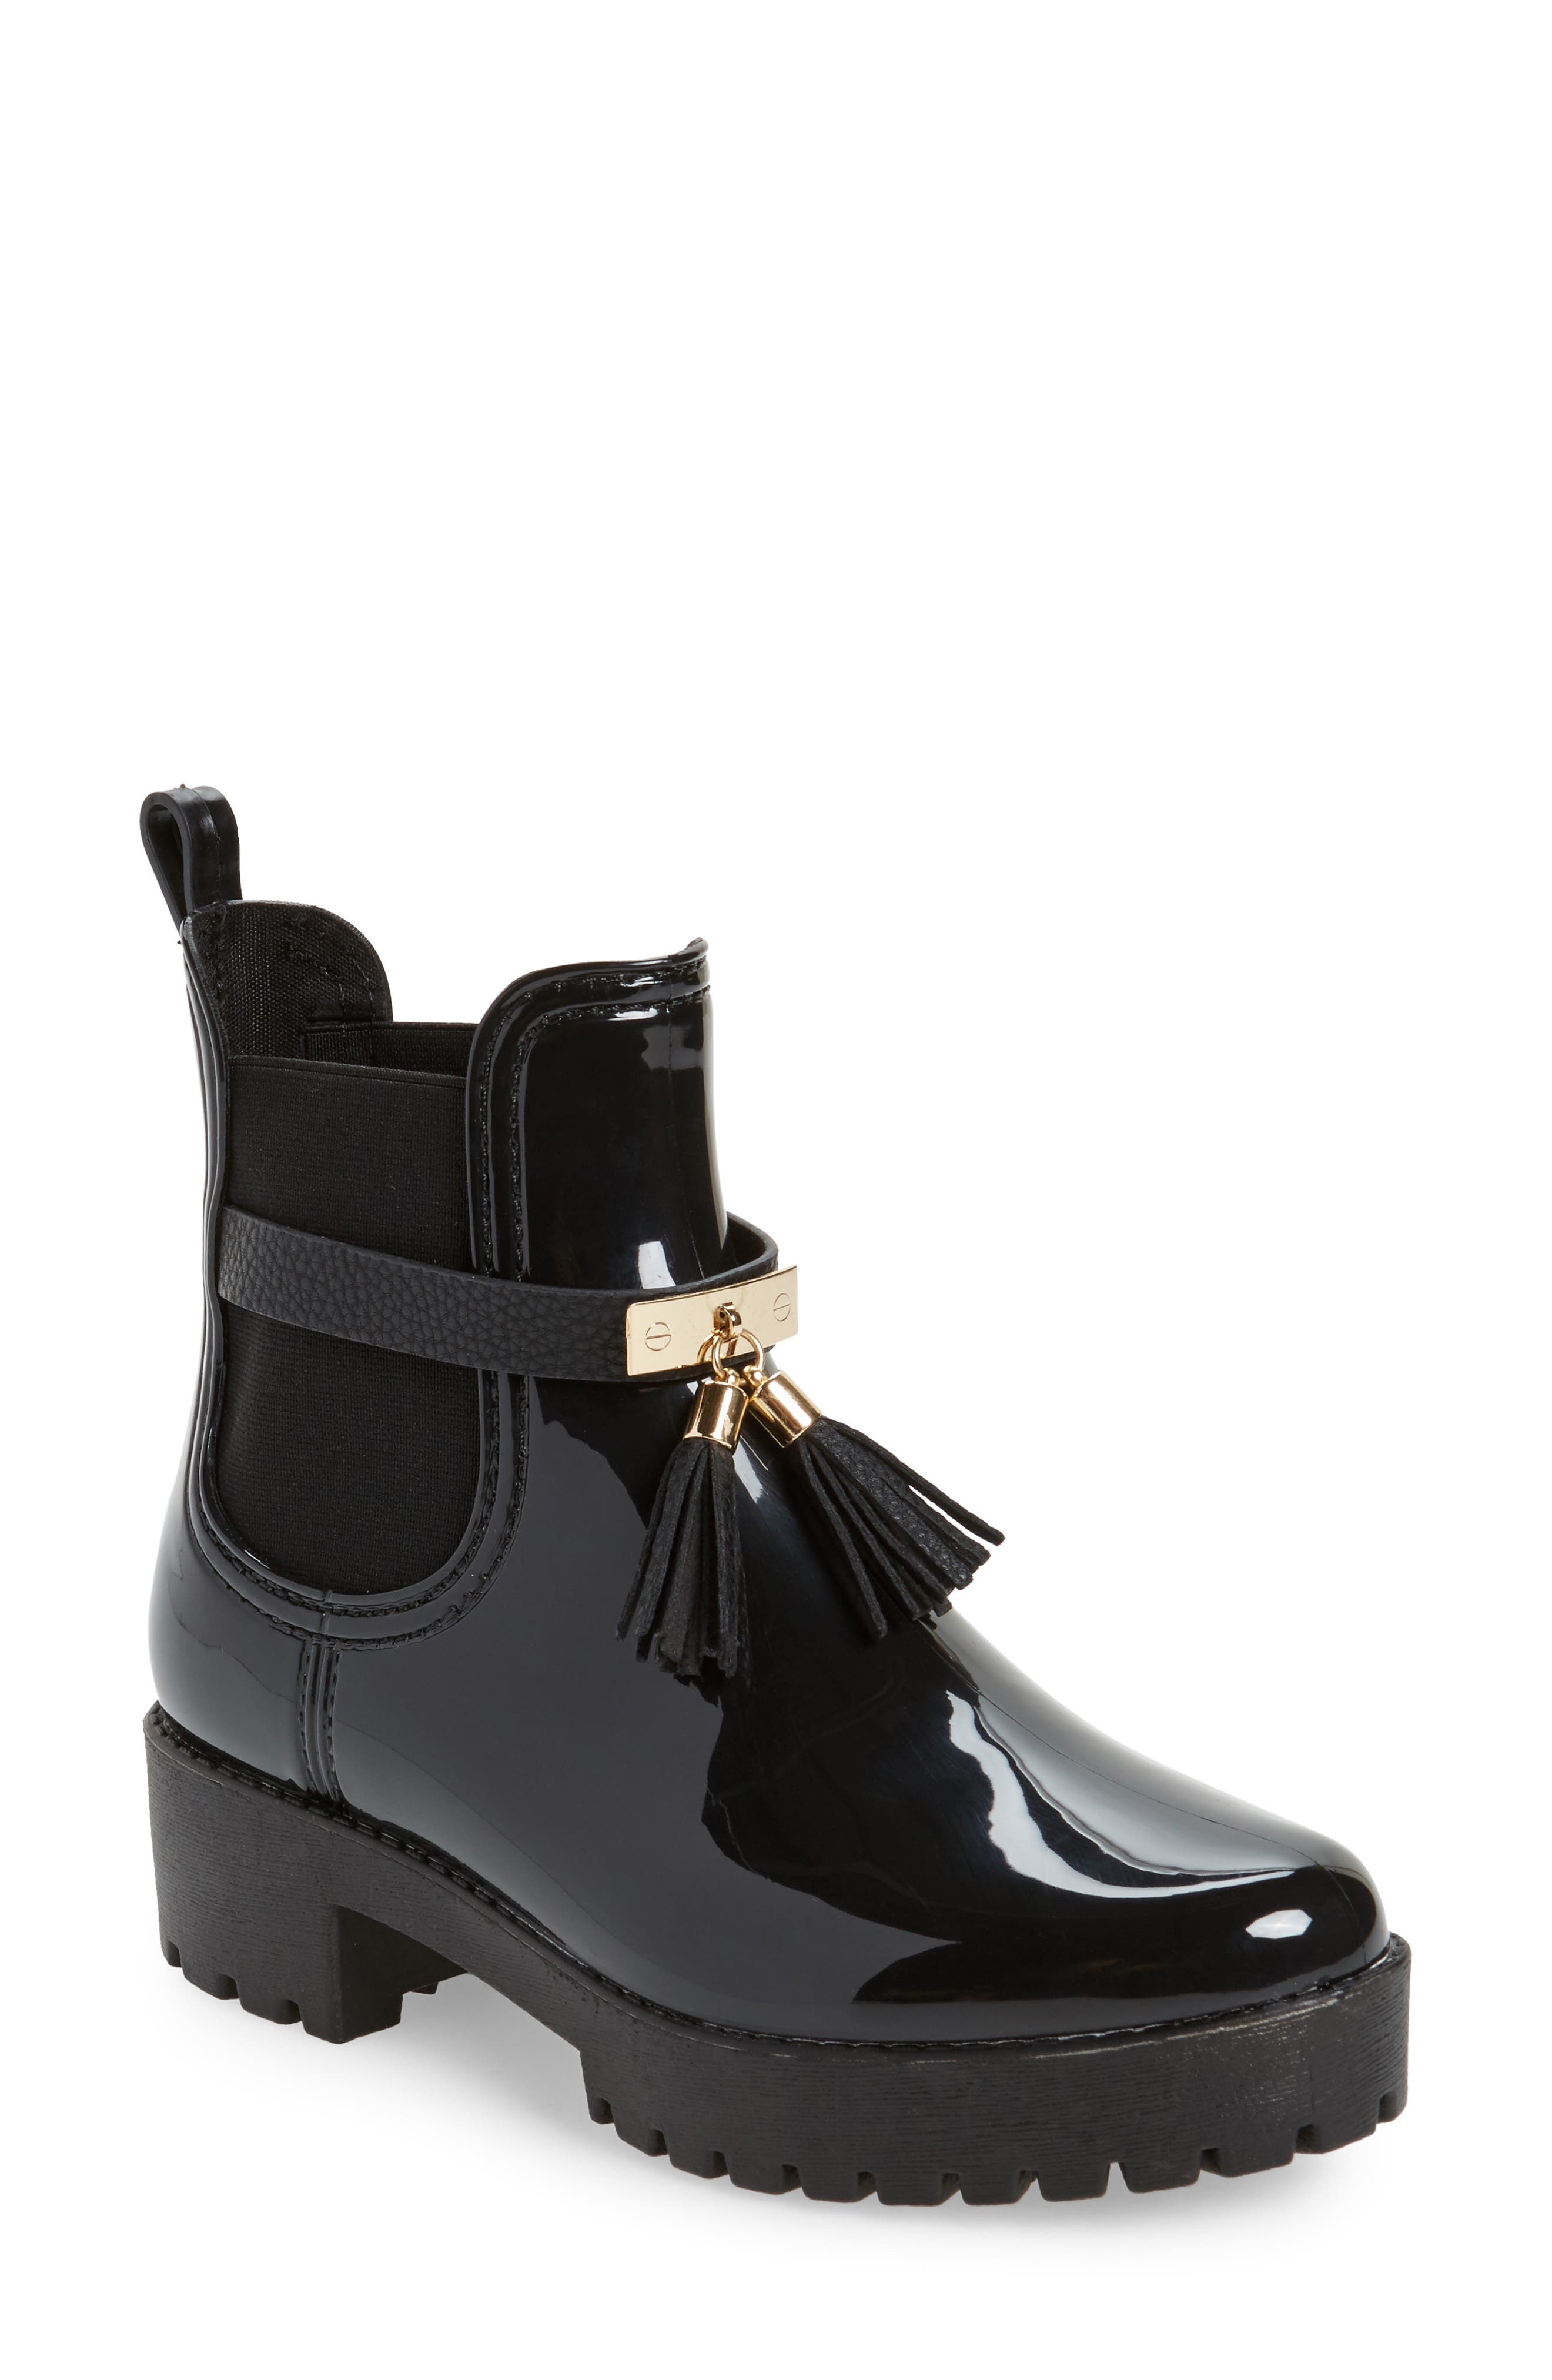 Leeds Tassel Waterproof Chelsea Boot,                             Main thumbnail 1, color,                             Black